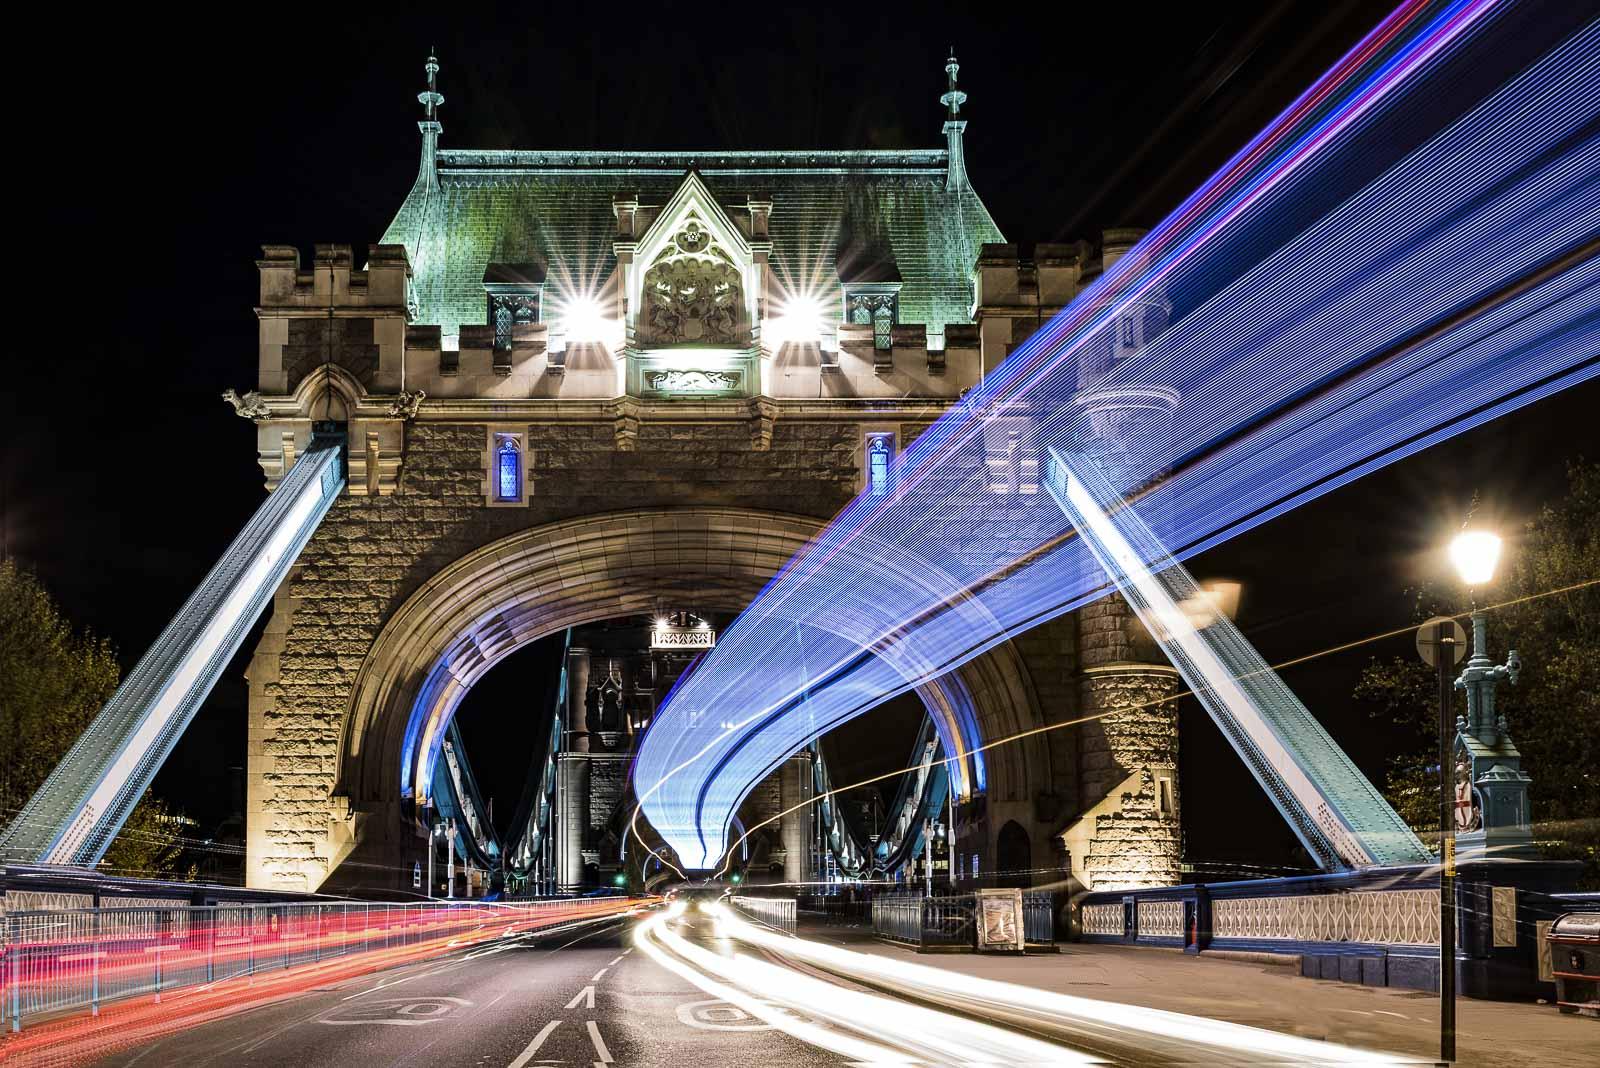 Tower Bridge, London - United Kingdom